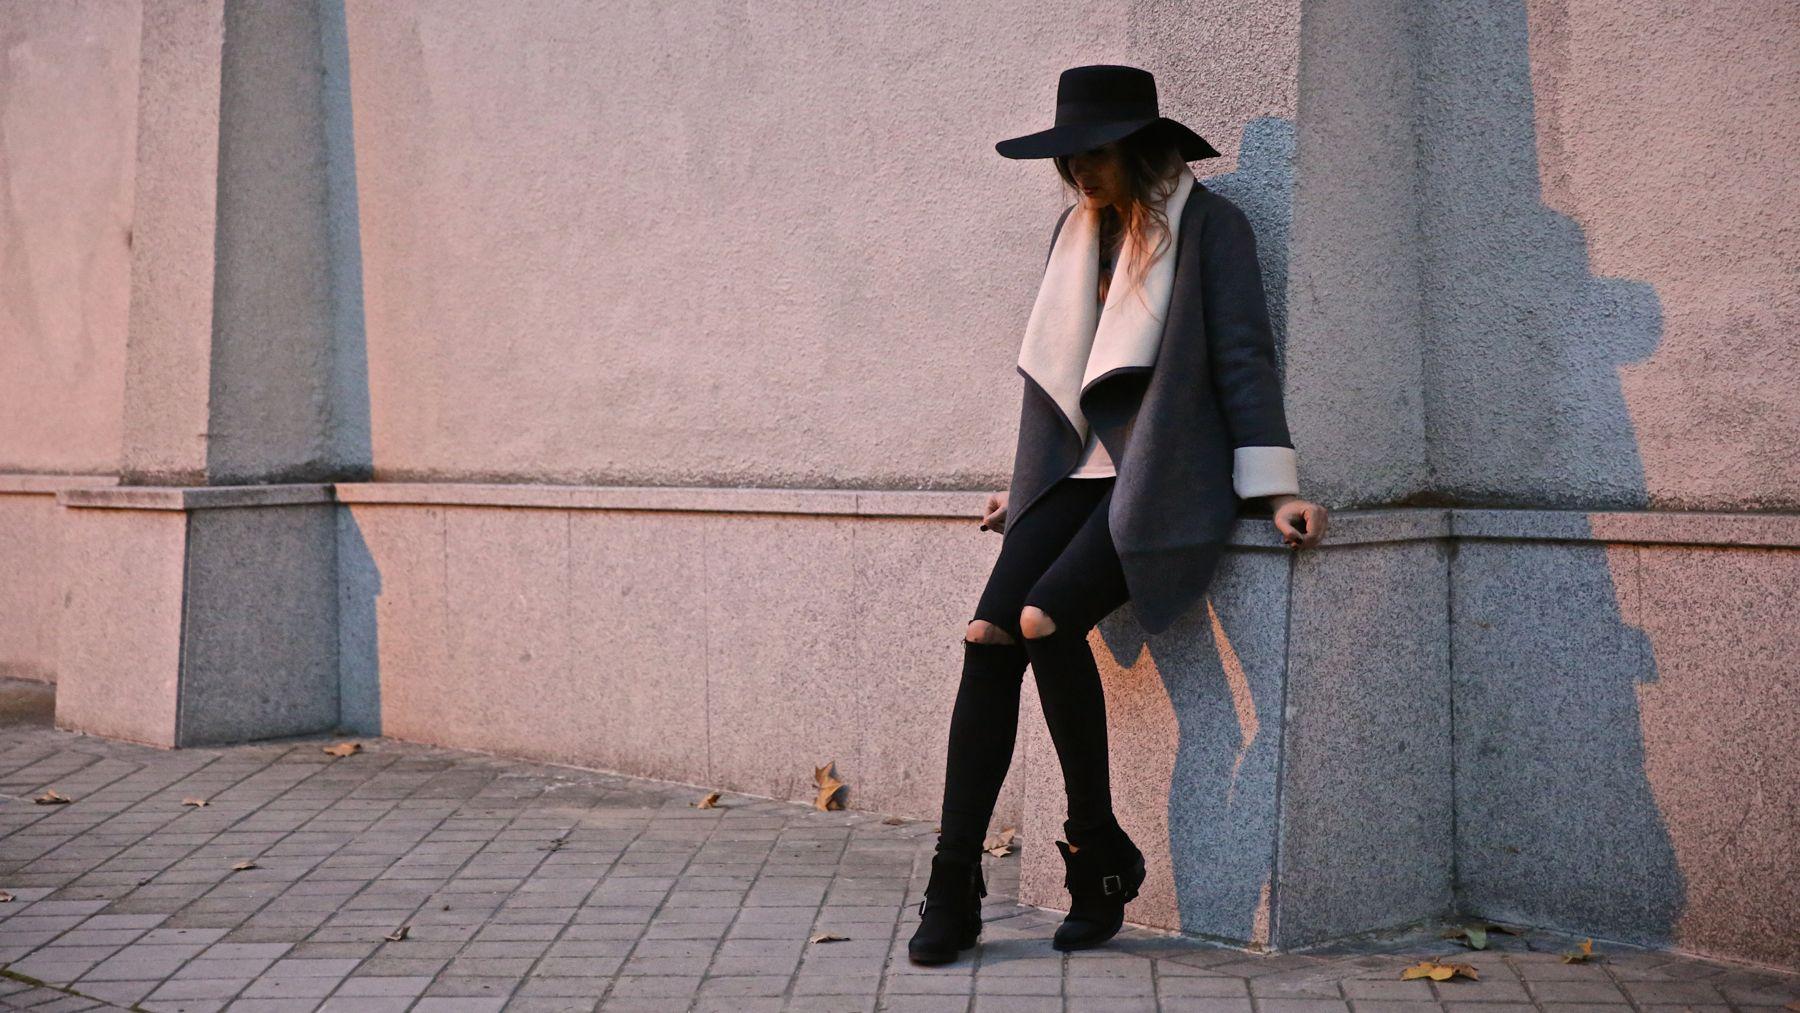 trendy_taste-look-outfit-street_style-ootd-blog-blogger-fashion_spain-moda_españa-abrigo_borrego-borreguillo-otoño-frio-cold-hat-sombrero-boho-hippie-steve_madden-skinny_jeans-pitillos-fall-4